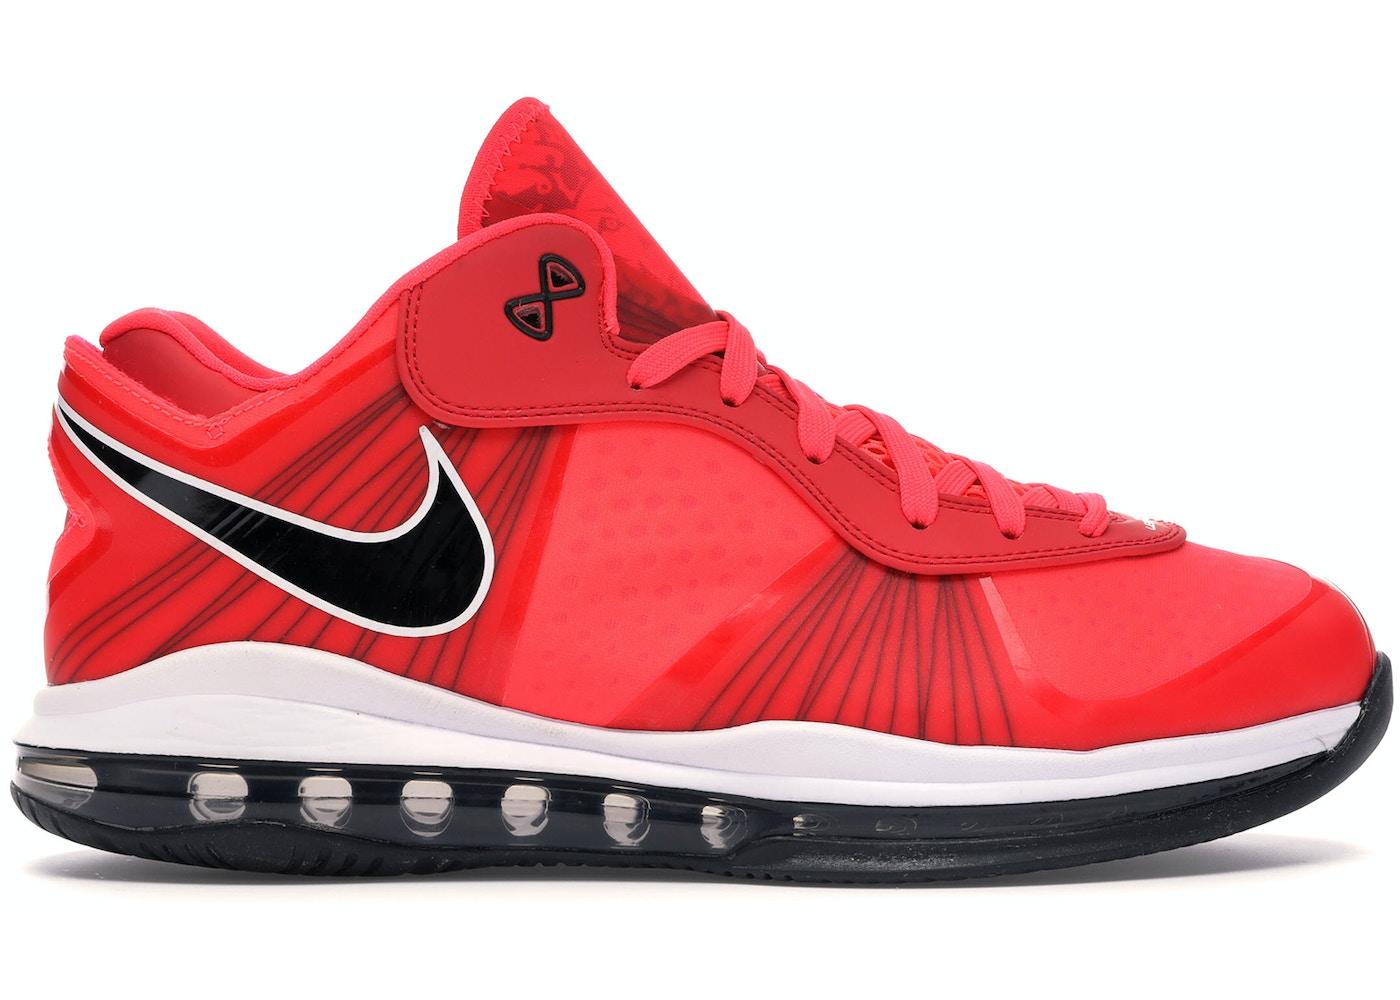 best service a8f7f 55606 Buy Nike LeBron Shoes & Deadstock Sneakers